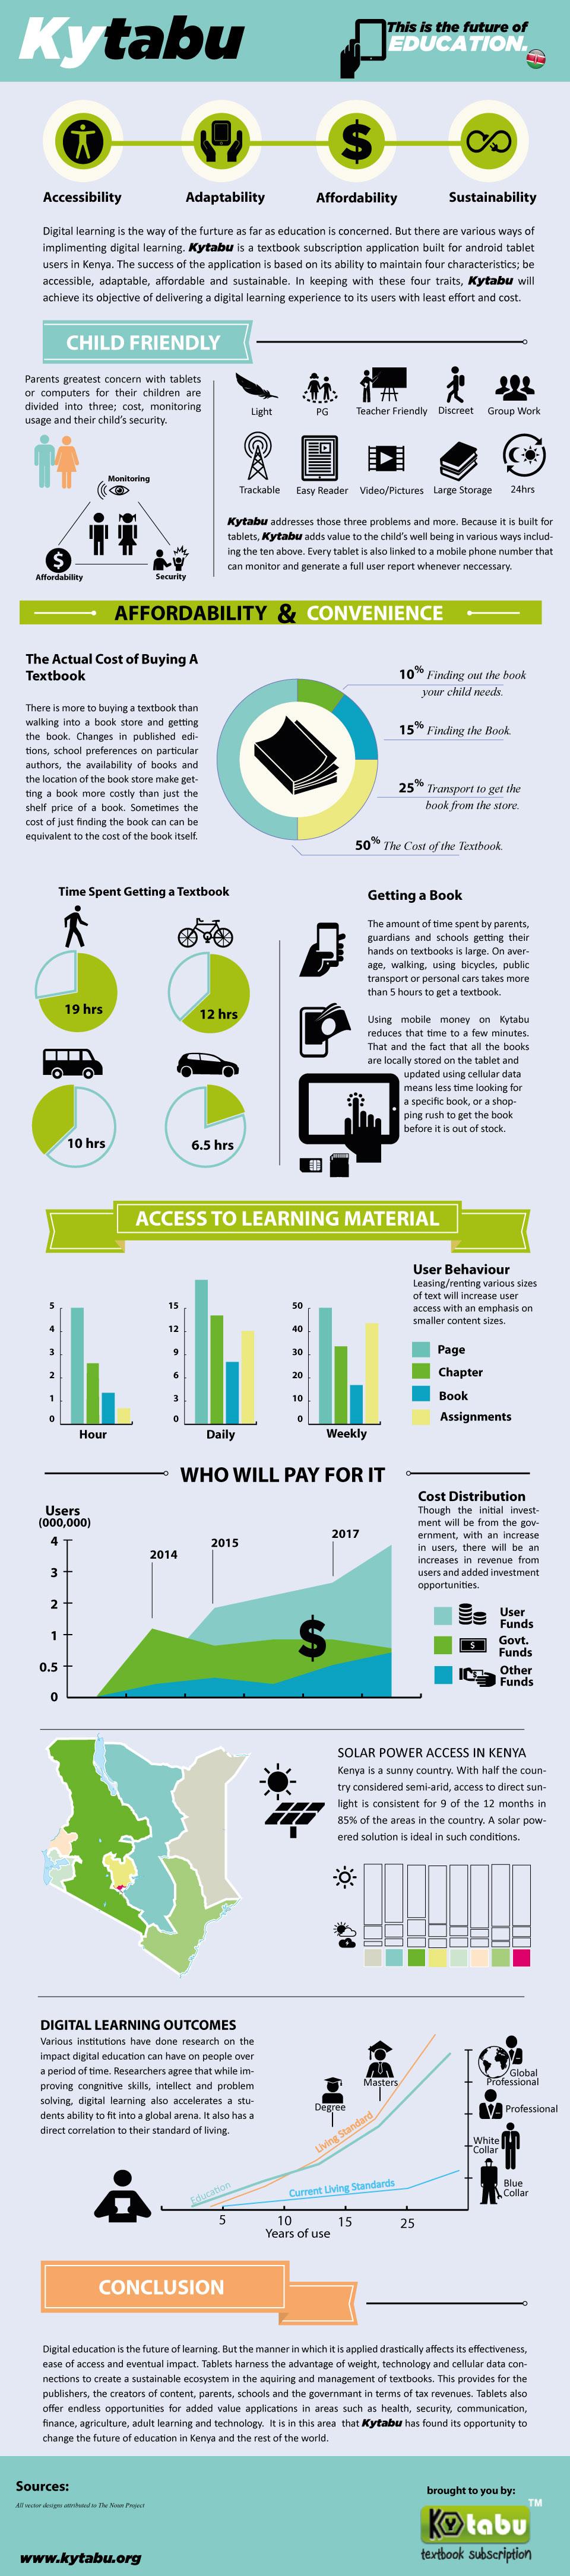 Kytabu-infographic